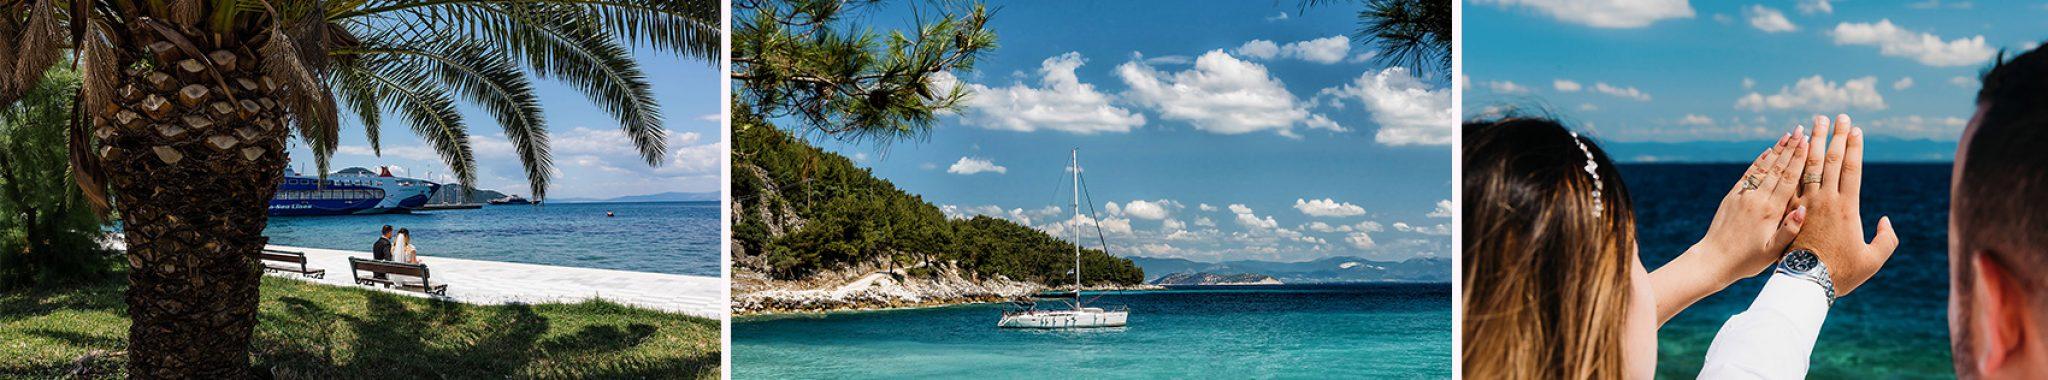 sedinta foto thrash the dress thassos Grecia